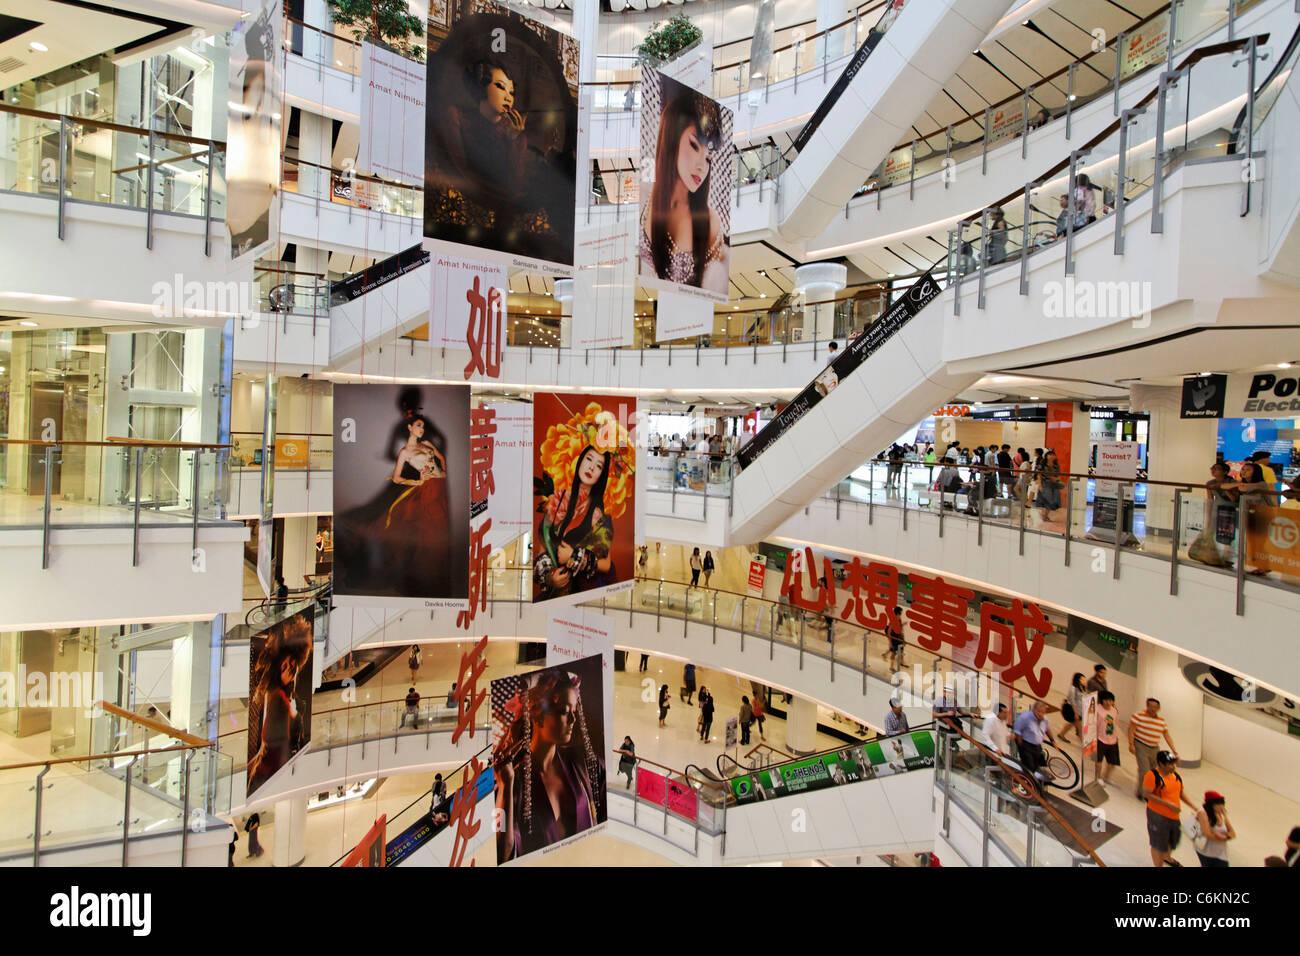 Central World Shopping Plaza, Bangkok, Thailand - Stock Image